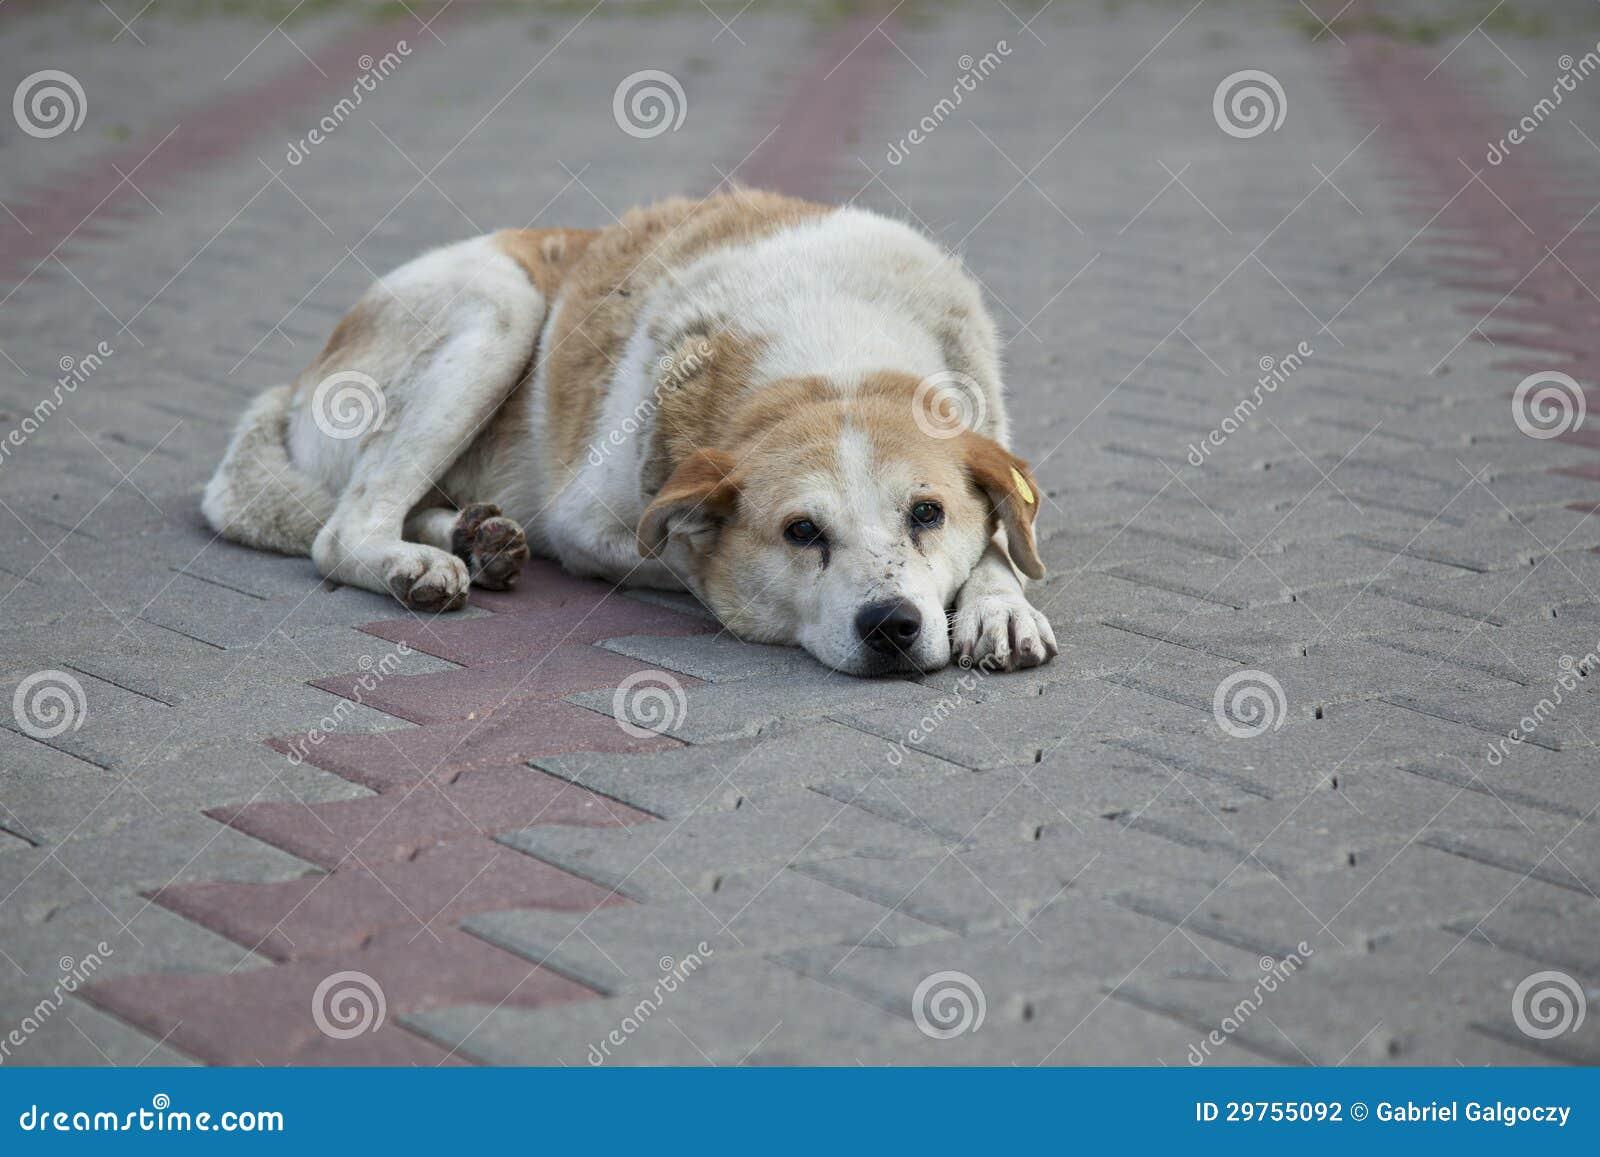 Sad Homeless Stray Dog Stock Photography - Image: 29755092